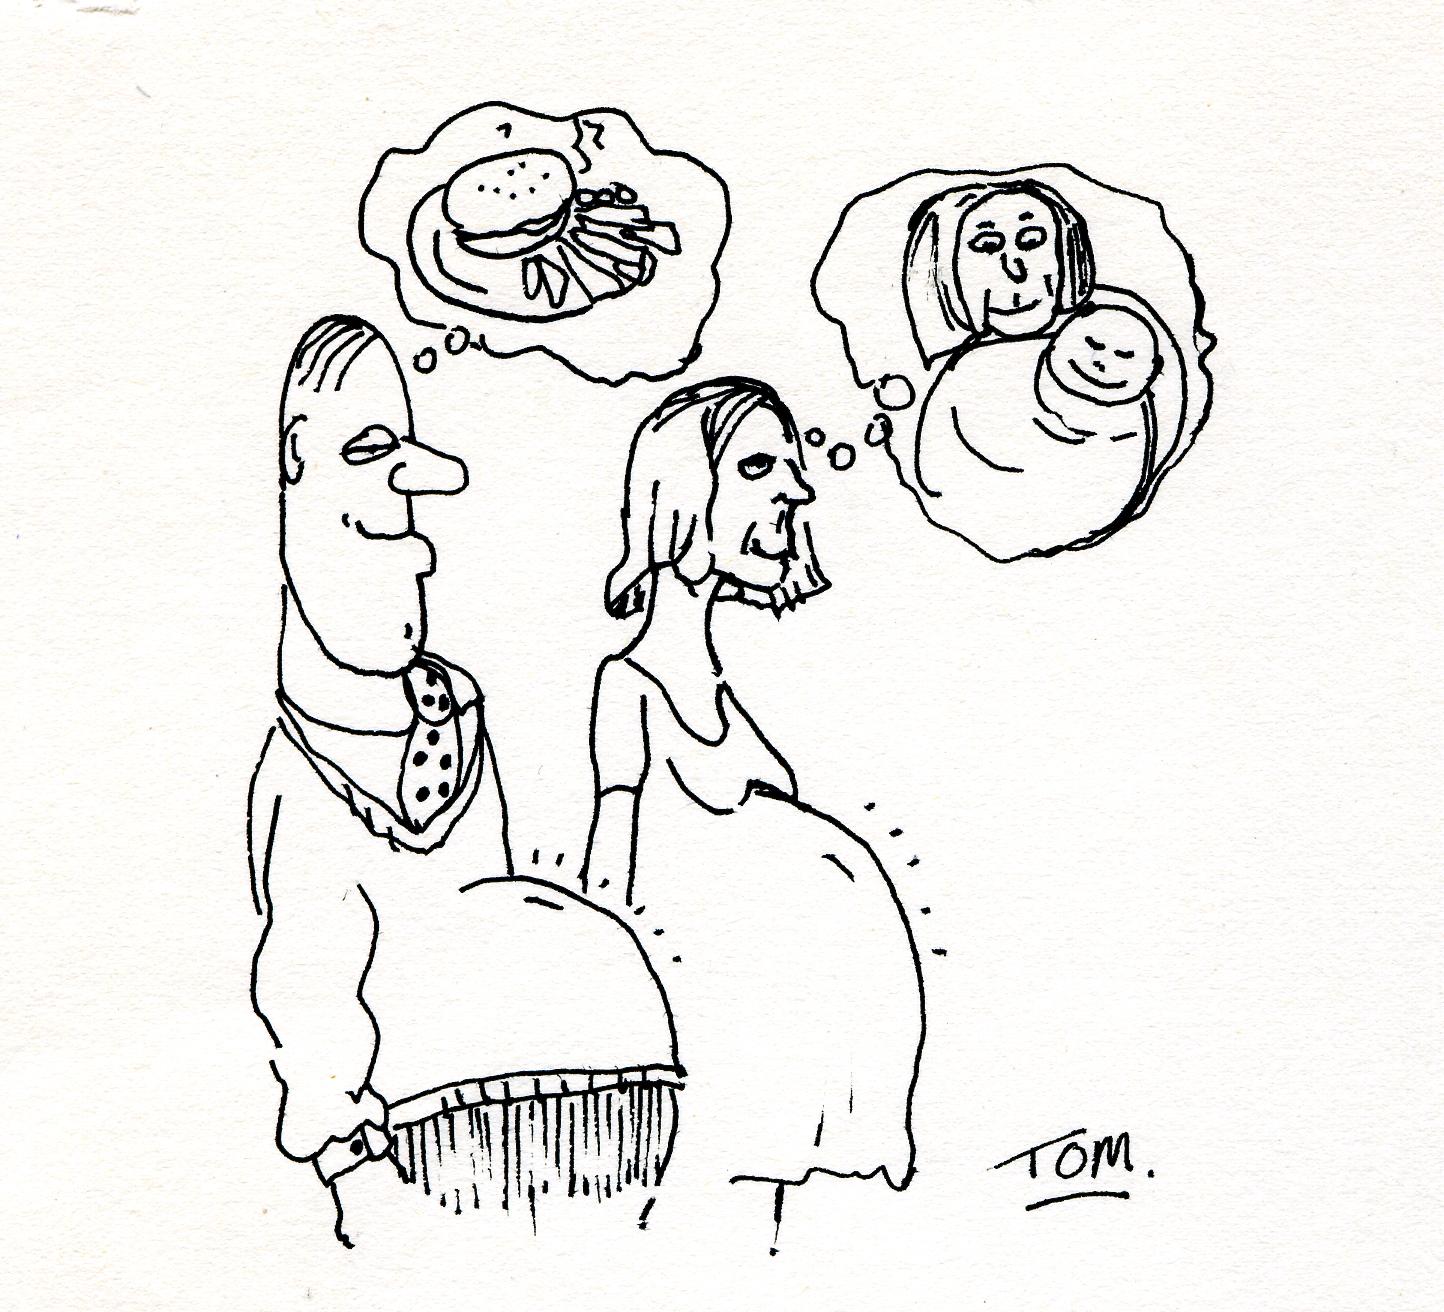 Polymath Cartoons